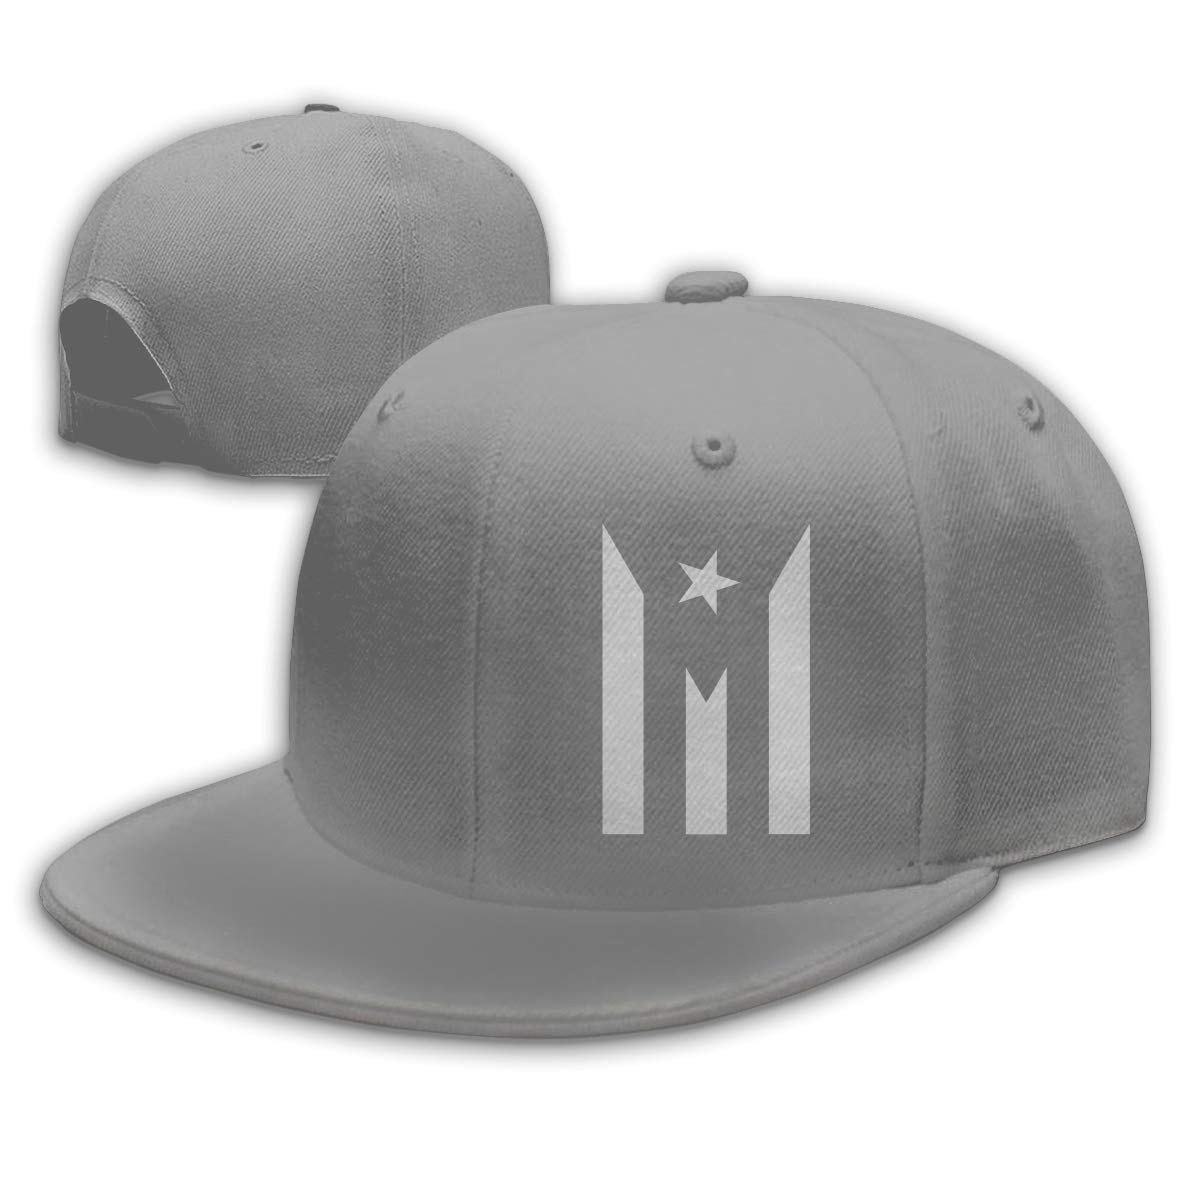 5e9caea46f3 Amazon.com  Men Women Fashion Puerto Rico Hat Resiste Boricua Flag  Adjustable Flat Brim Baseball Cap for Outdoor Sun Snapback Hats Black   Clothing